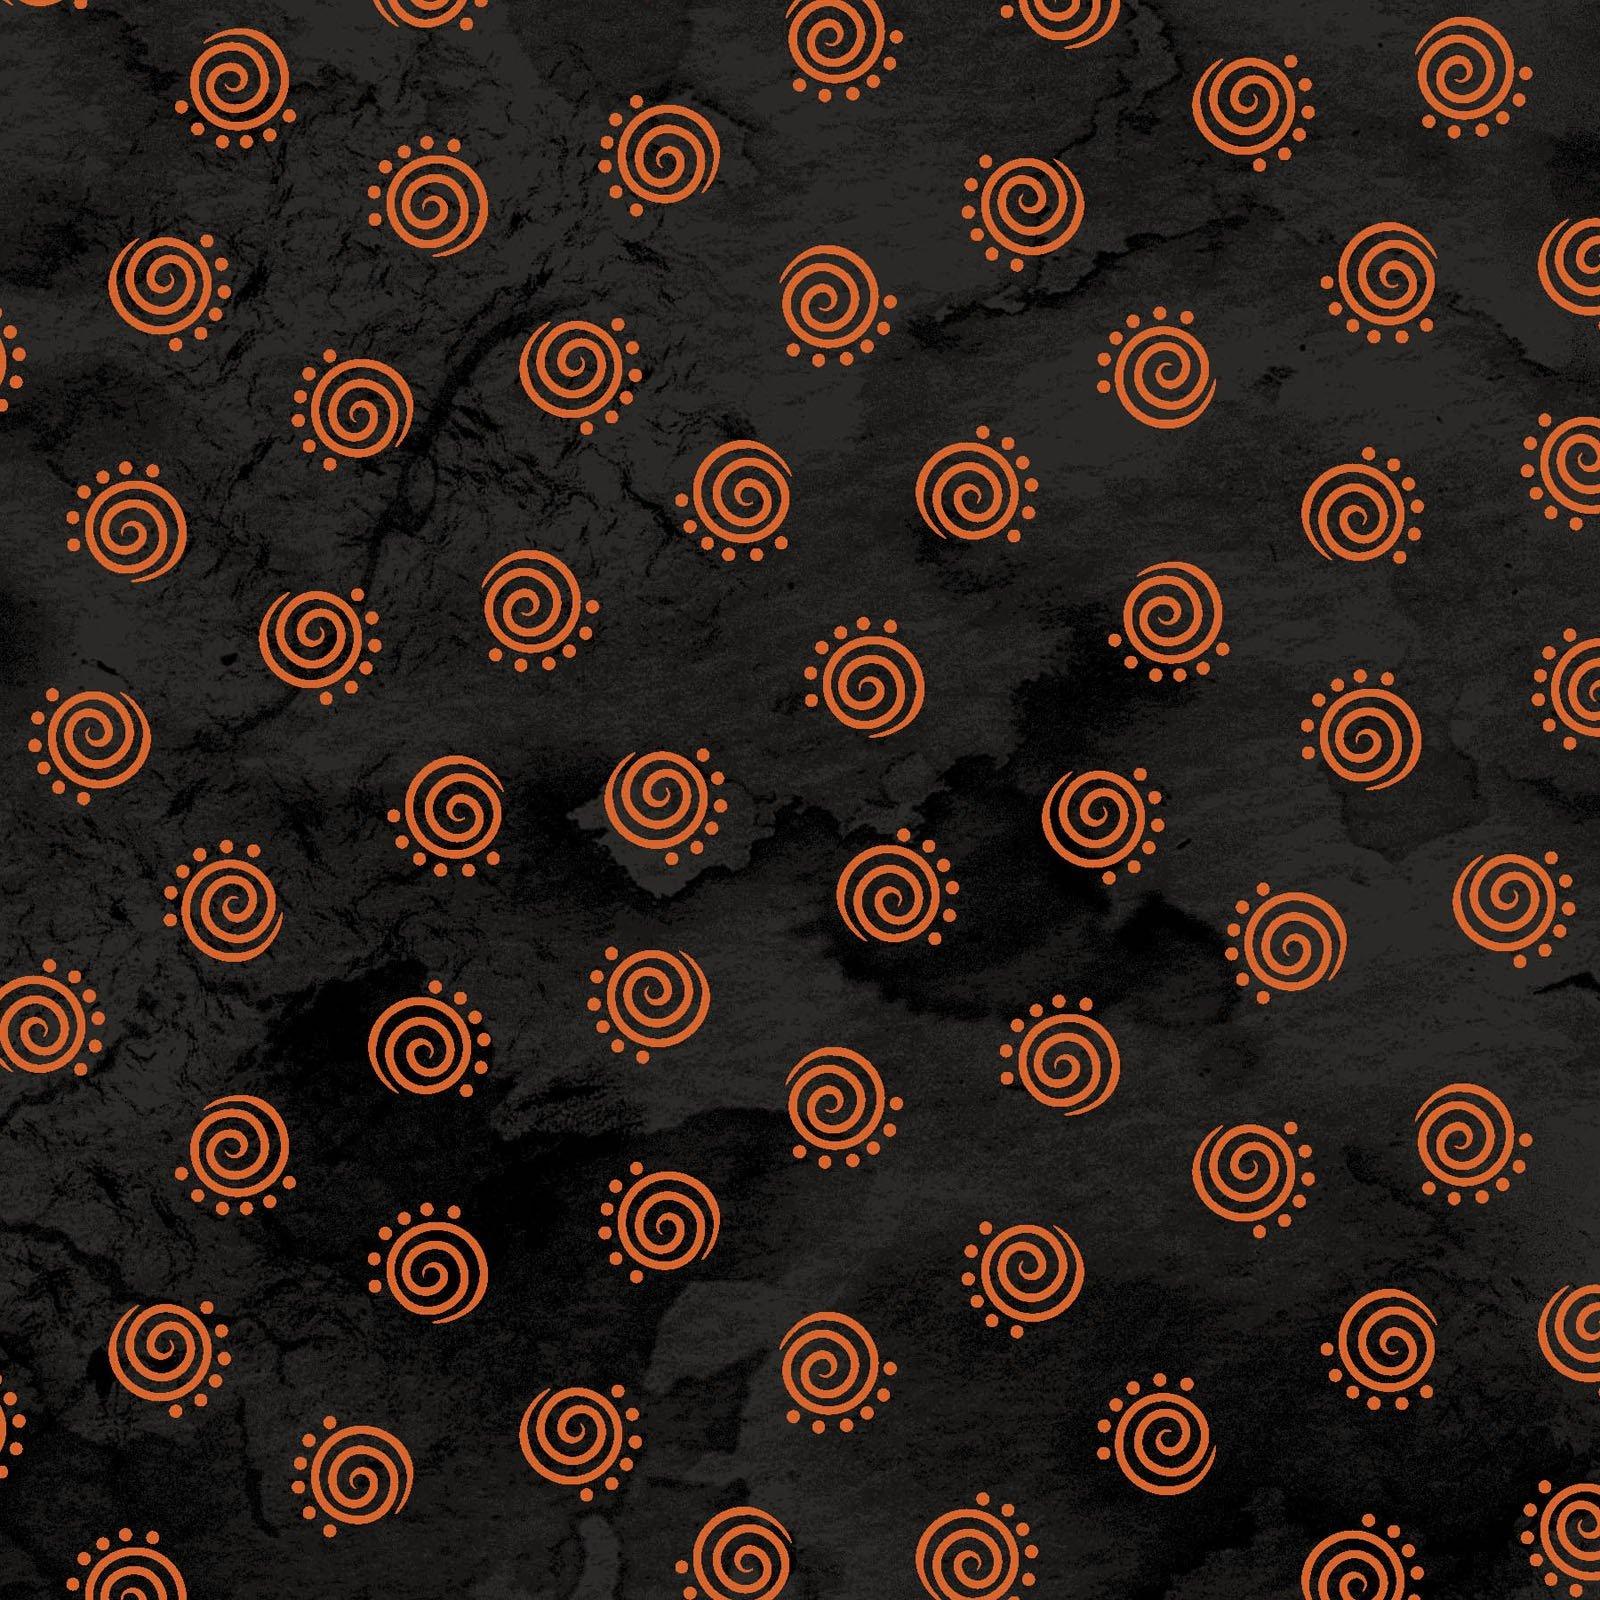 Robin Kingsey - Halloweenie  Geo Swirls Black and Orange